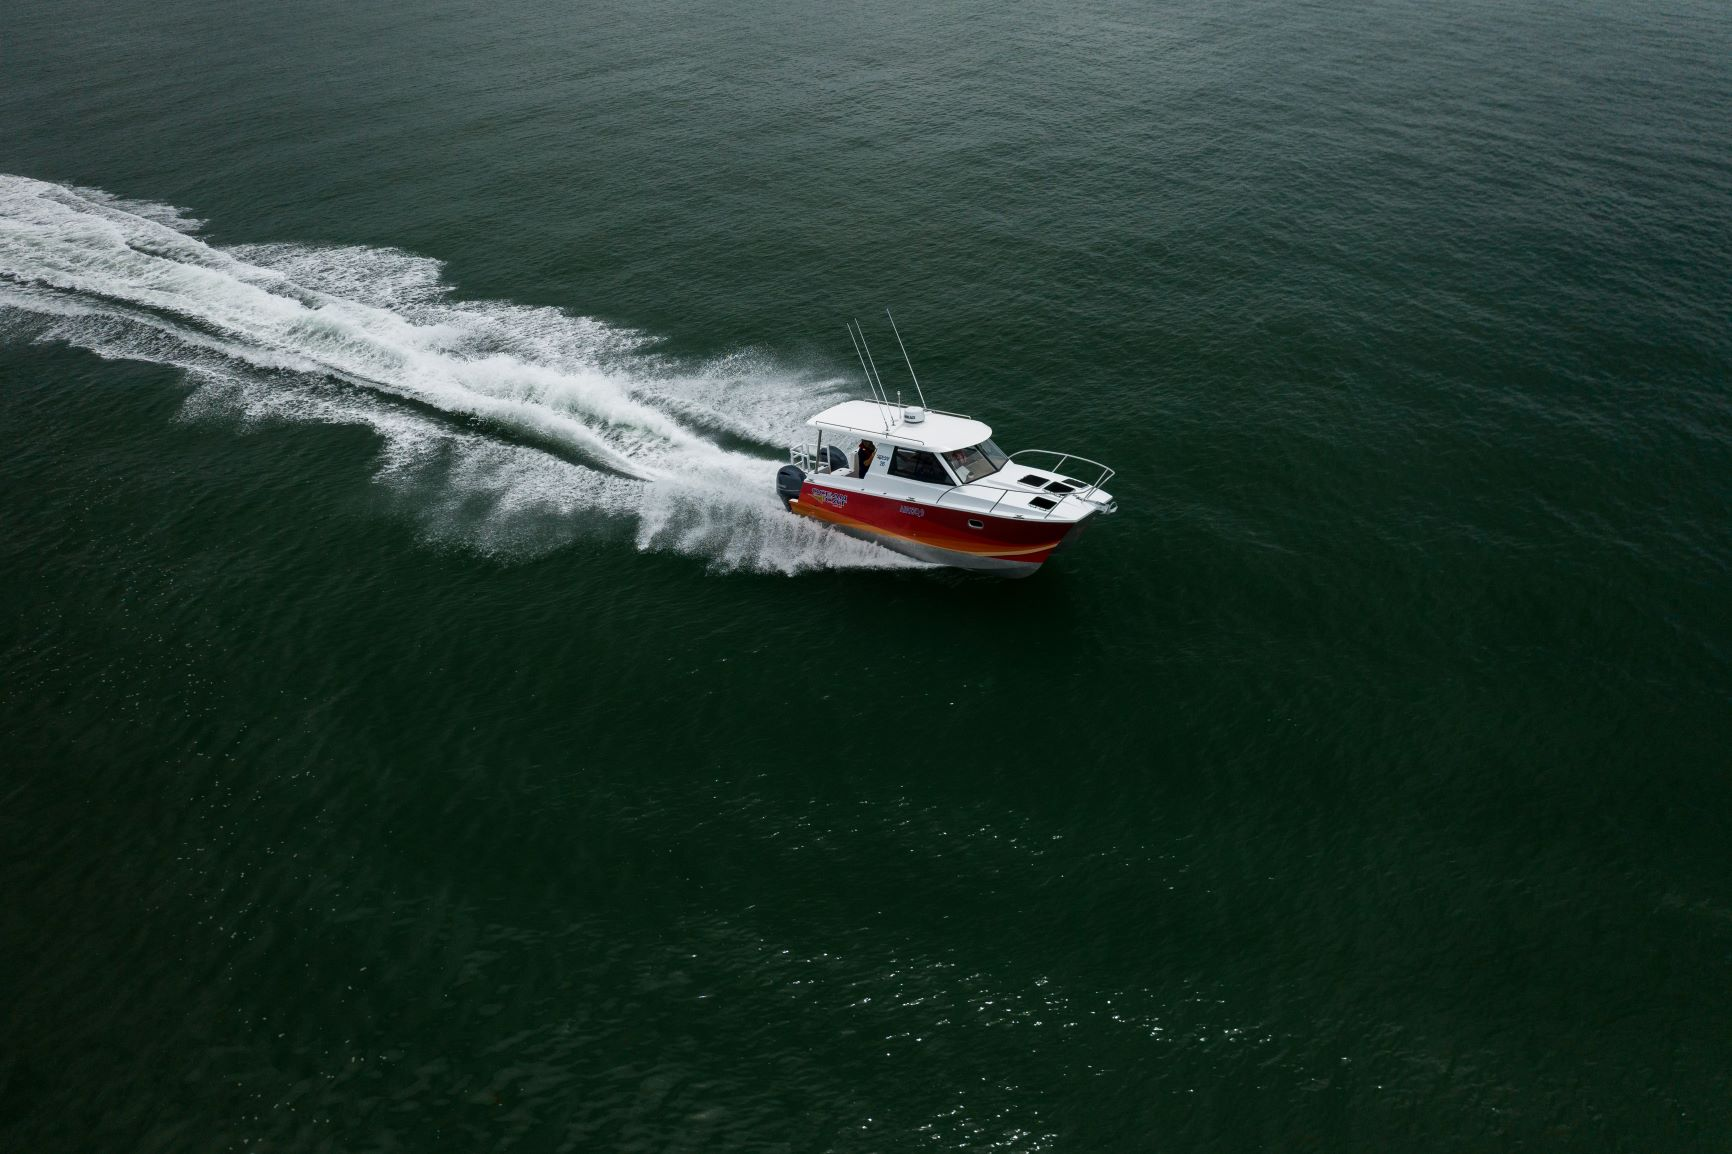 OceanCat Marine and Yamaha Test Day